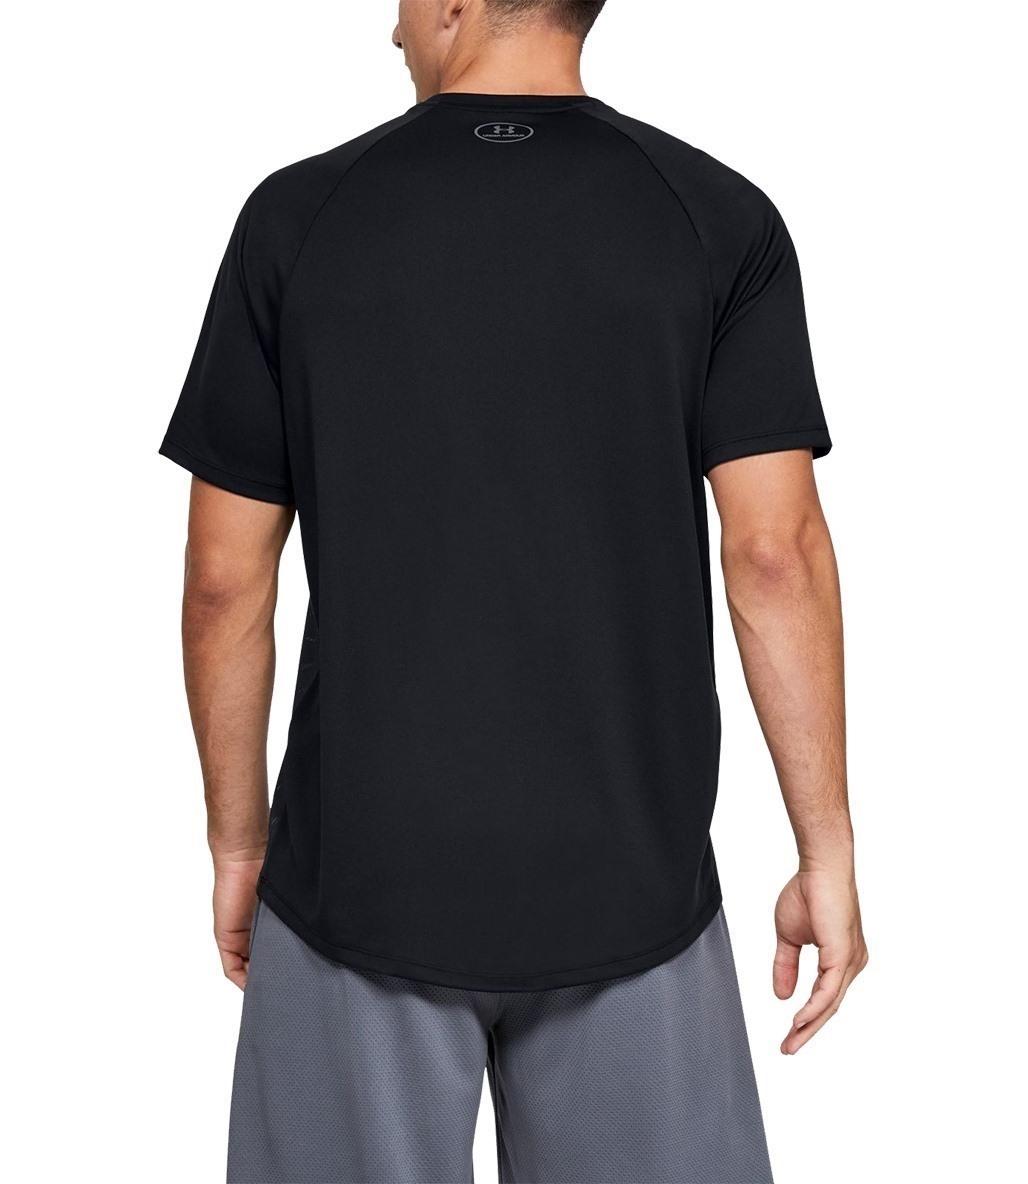 Under Armour 2.0 Emboss Short Sleeve T-Shirt Siyah-Gri